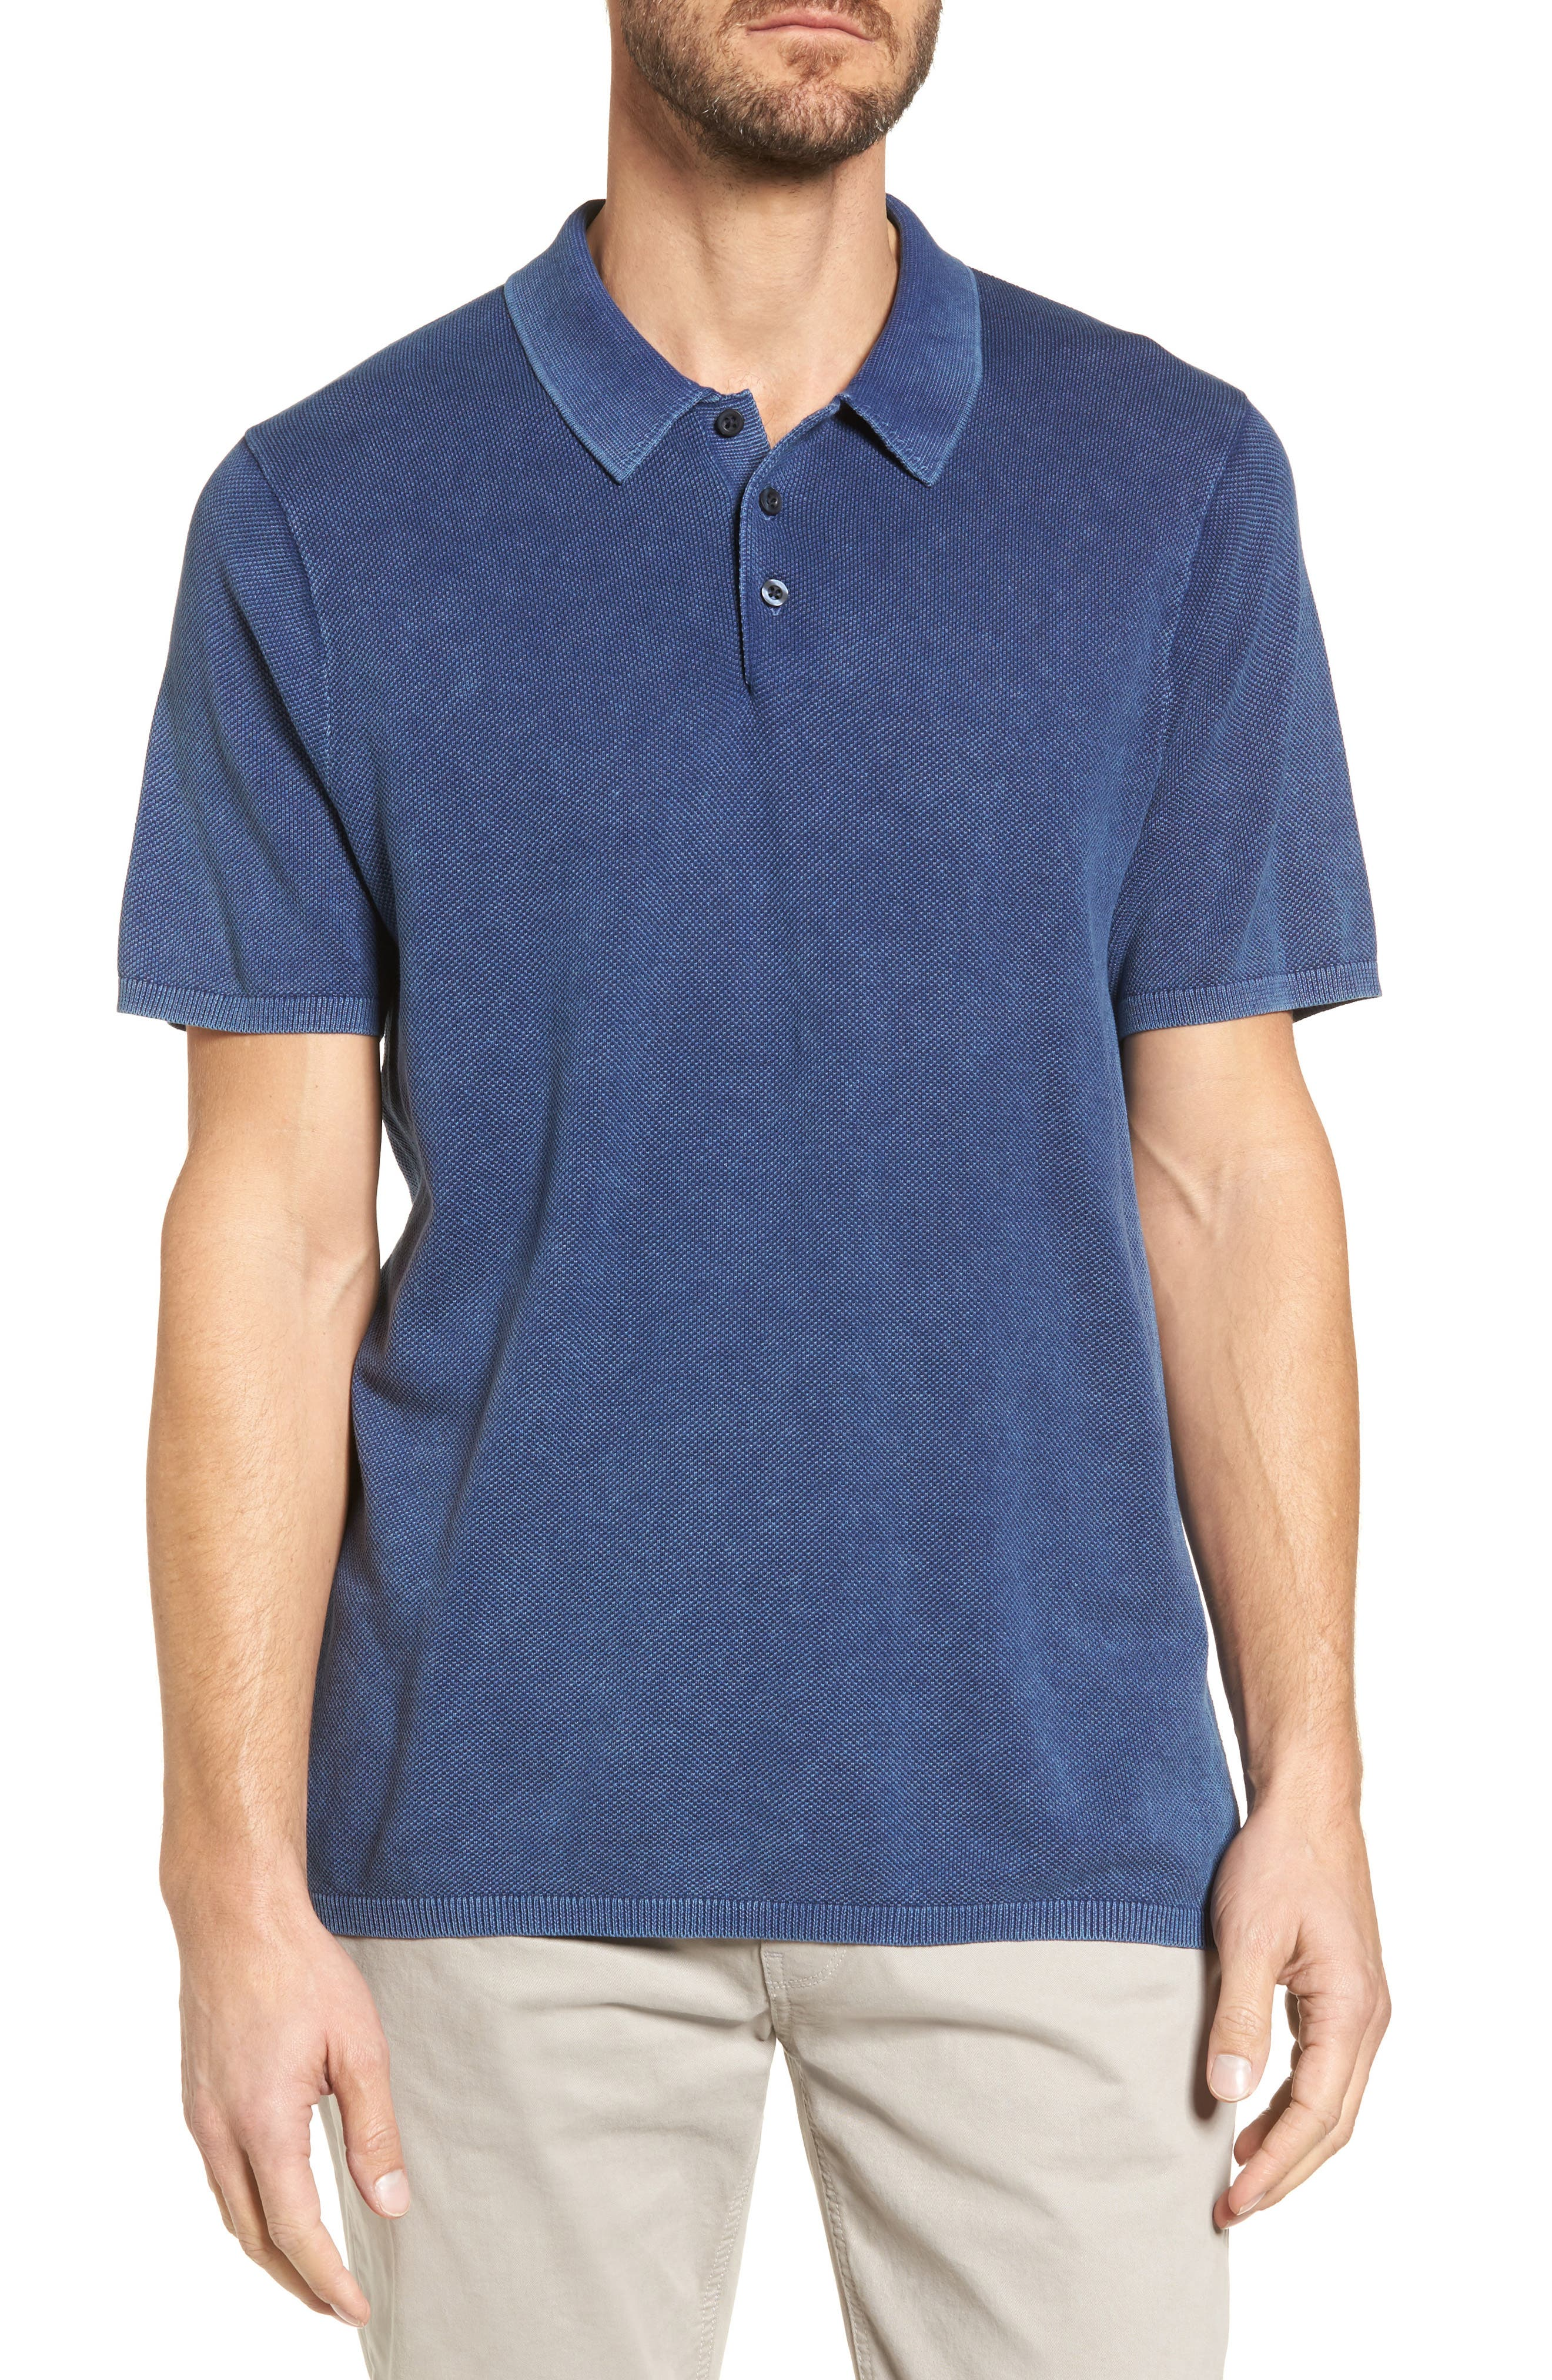 Nordstrom Men's Shop Cotton Sweater Polo